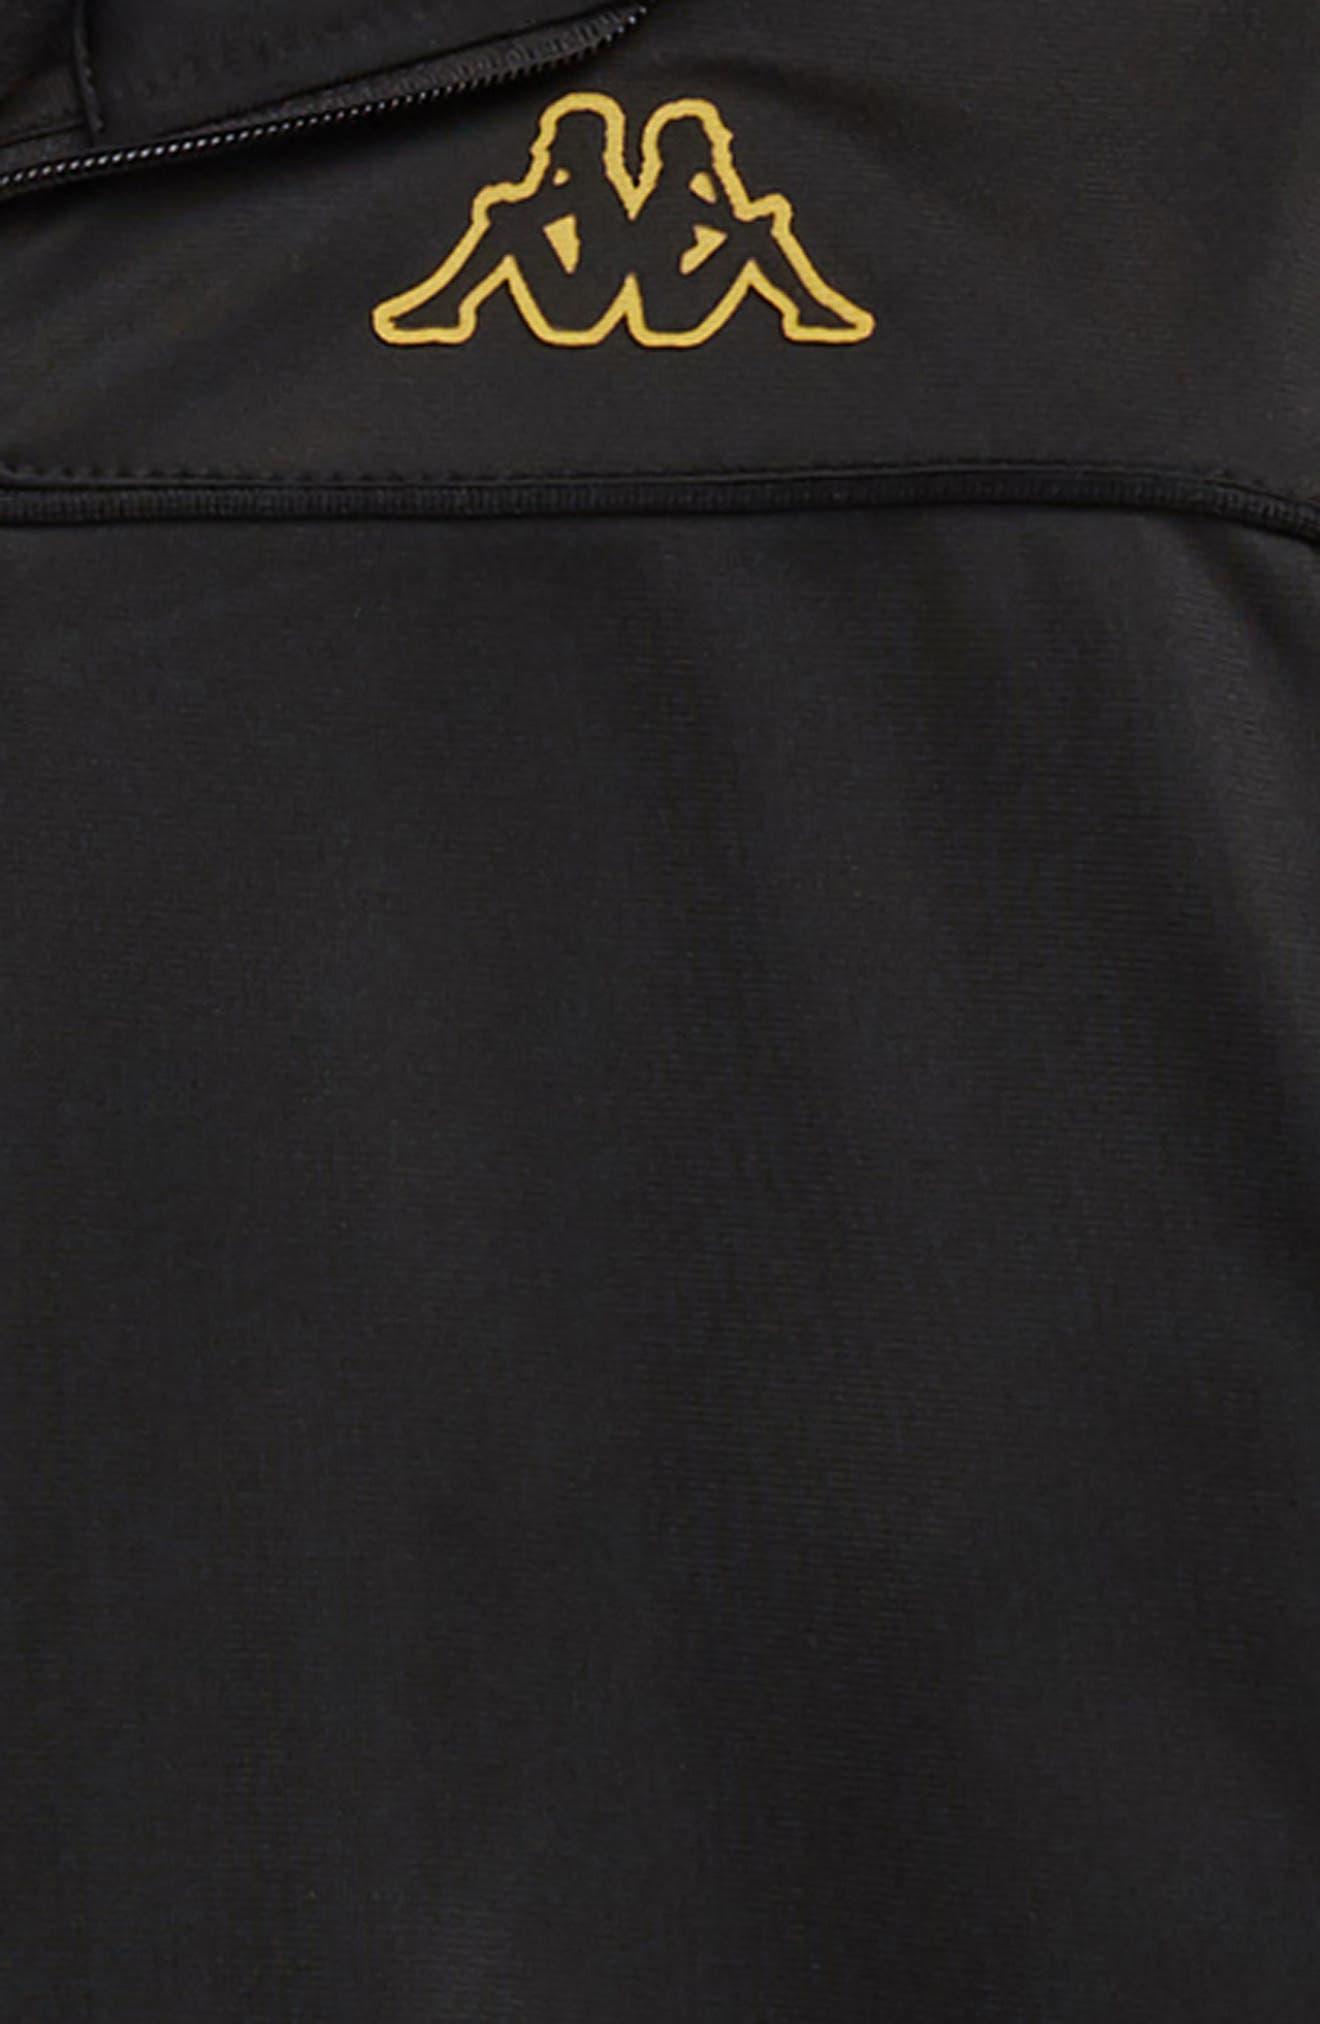 Banda Merez Slim Track Jacket,                             Alternate thumbnail 2, color,                             BLACK GOLD